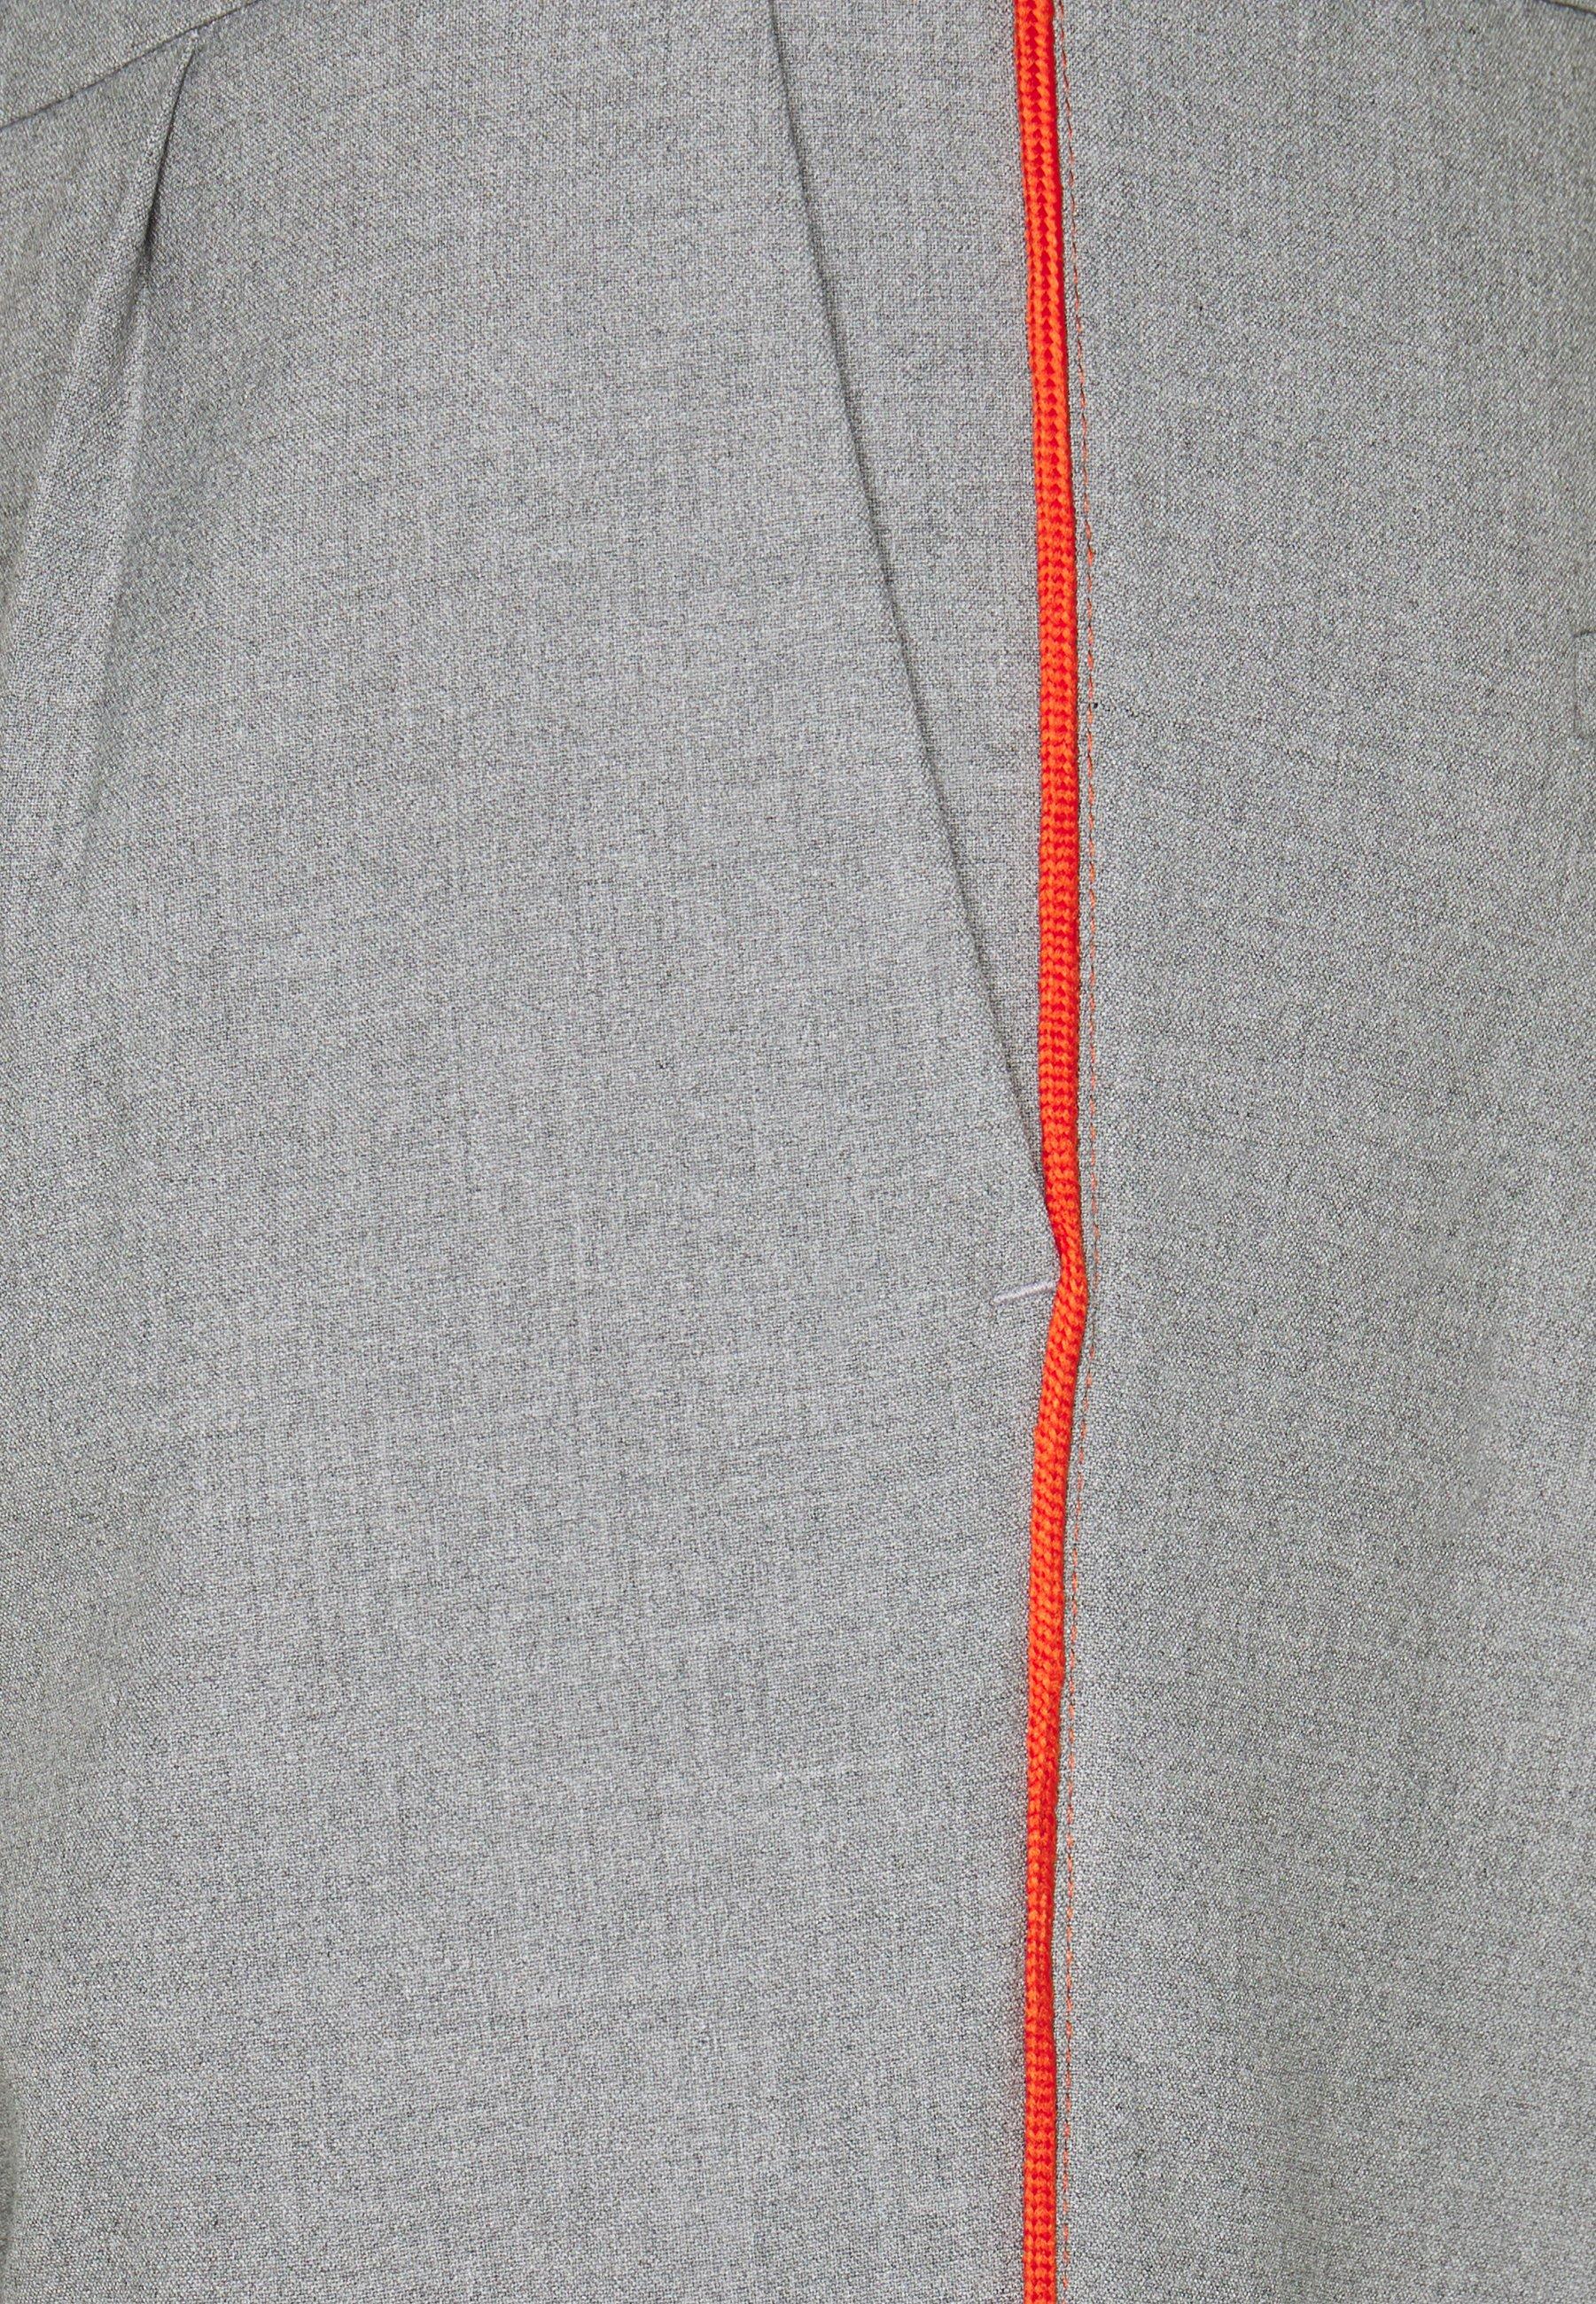 Pre Order Hot Sale Women's Clothing Cartoon Trousers middle grey melange dJ1N0ixld HNBqT6eqh